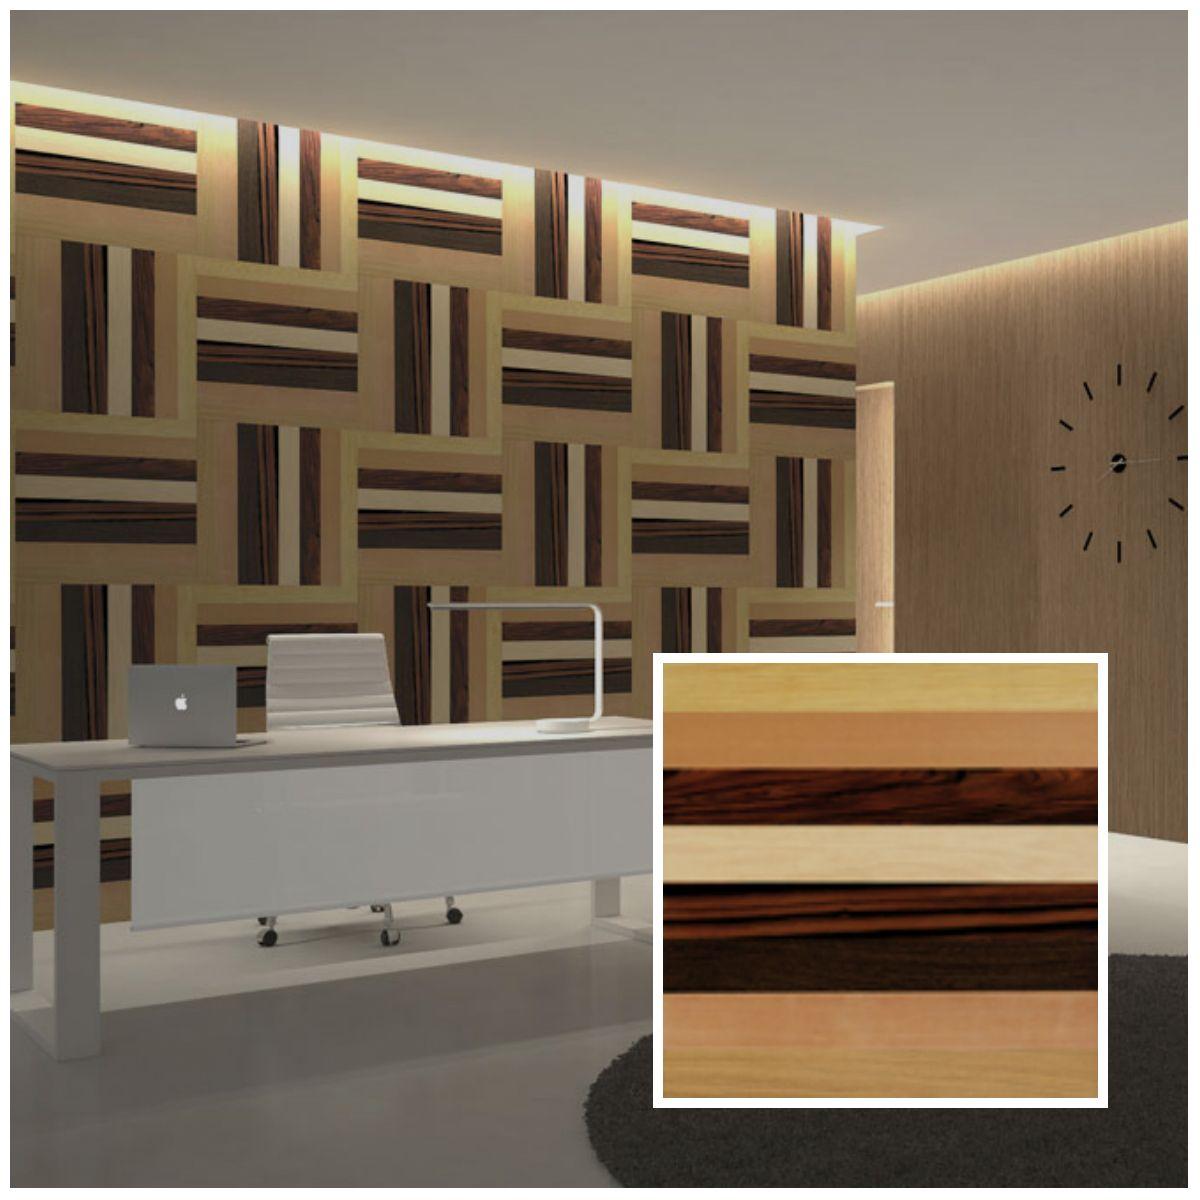 Paneles de madera reciclada join 40 39 s revestimientos para - Revestimiento pared madera ...